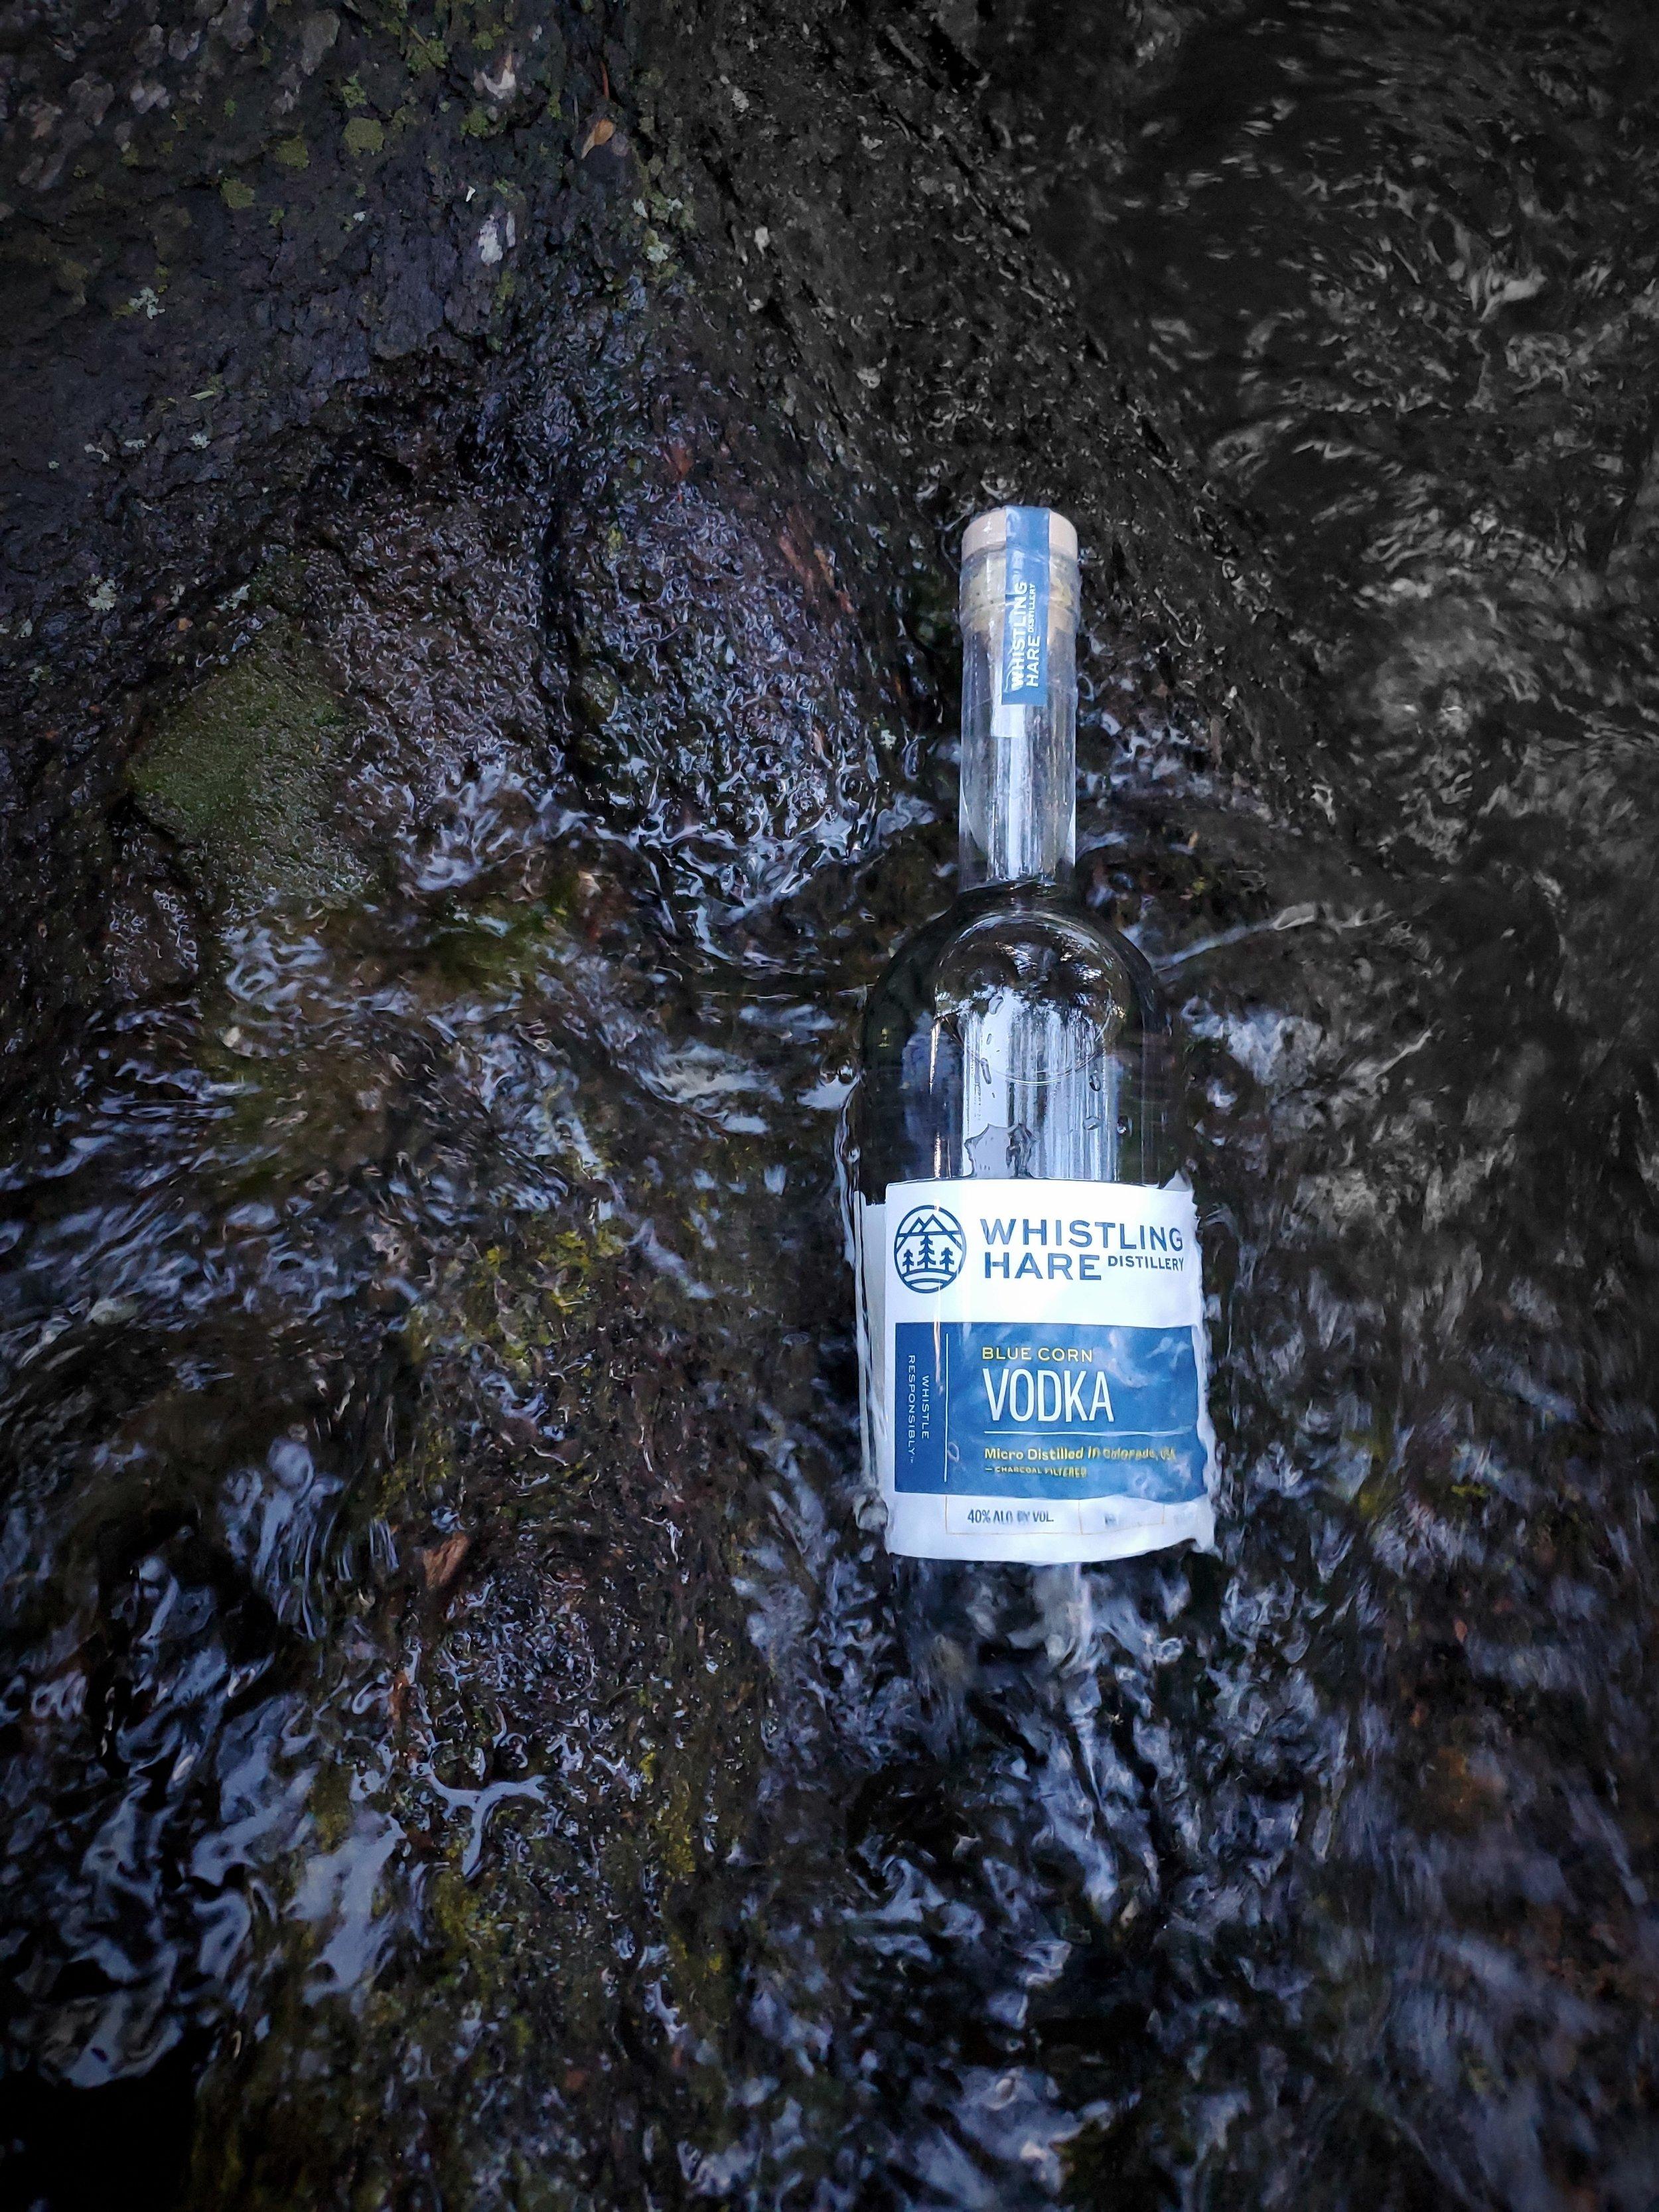 Blue Corn Vodka